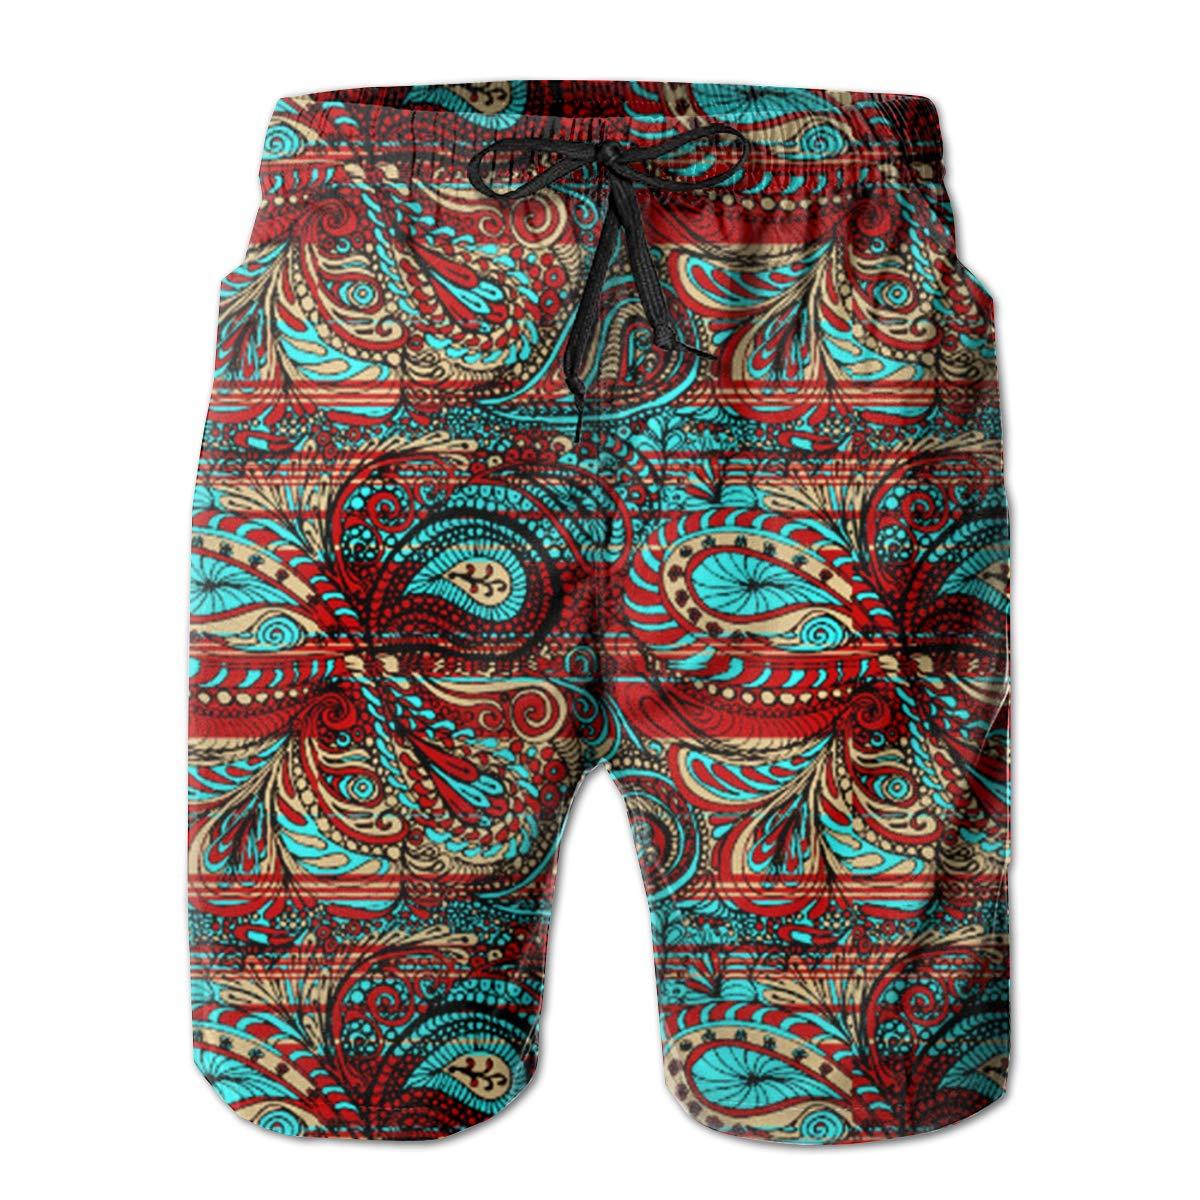 FUNSTYEET Paisley Bright Decorative Pattern Mens Board Shorts Swim Mesh Lining and Side Pocket